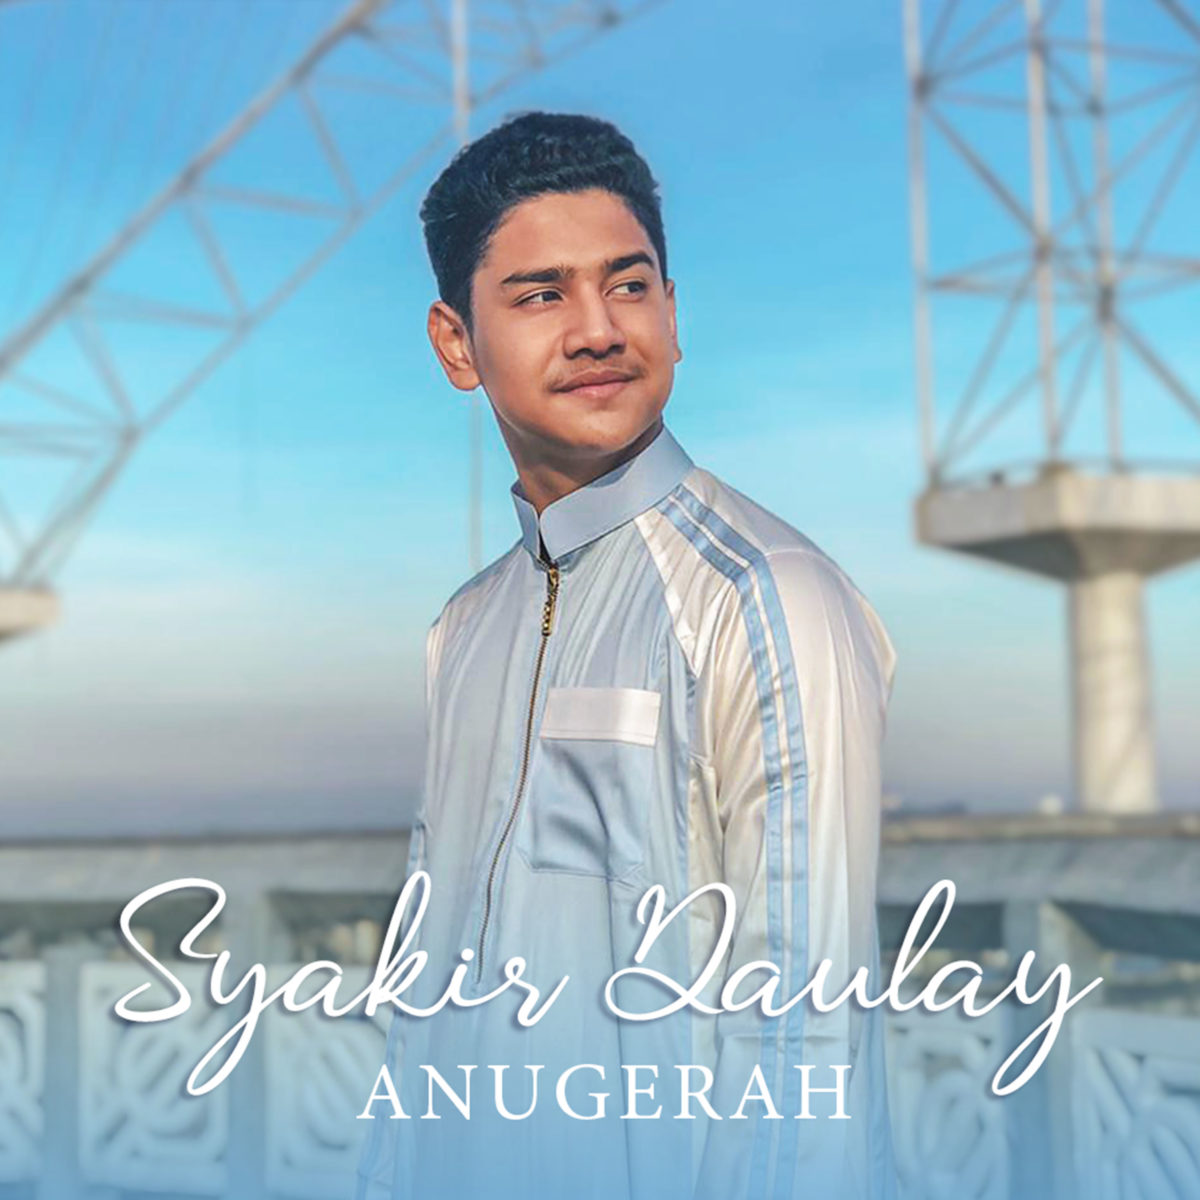 Lagu Bertemakan Cinta ala Syakir Daulay